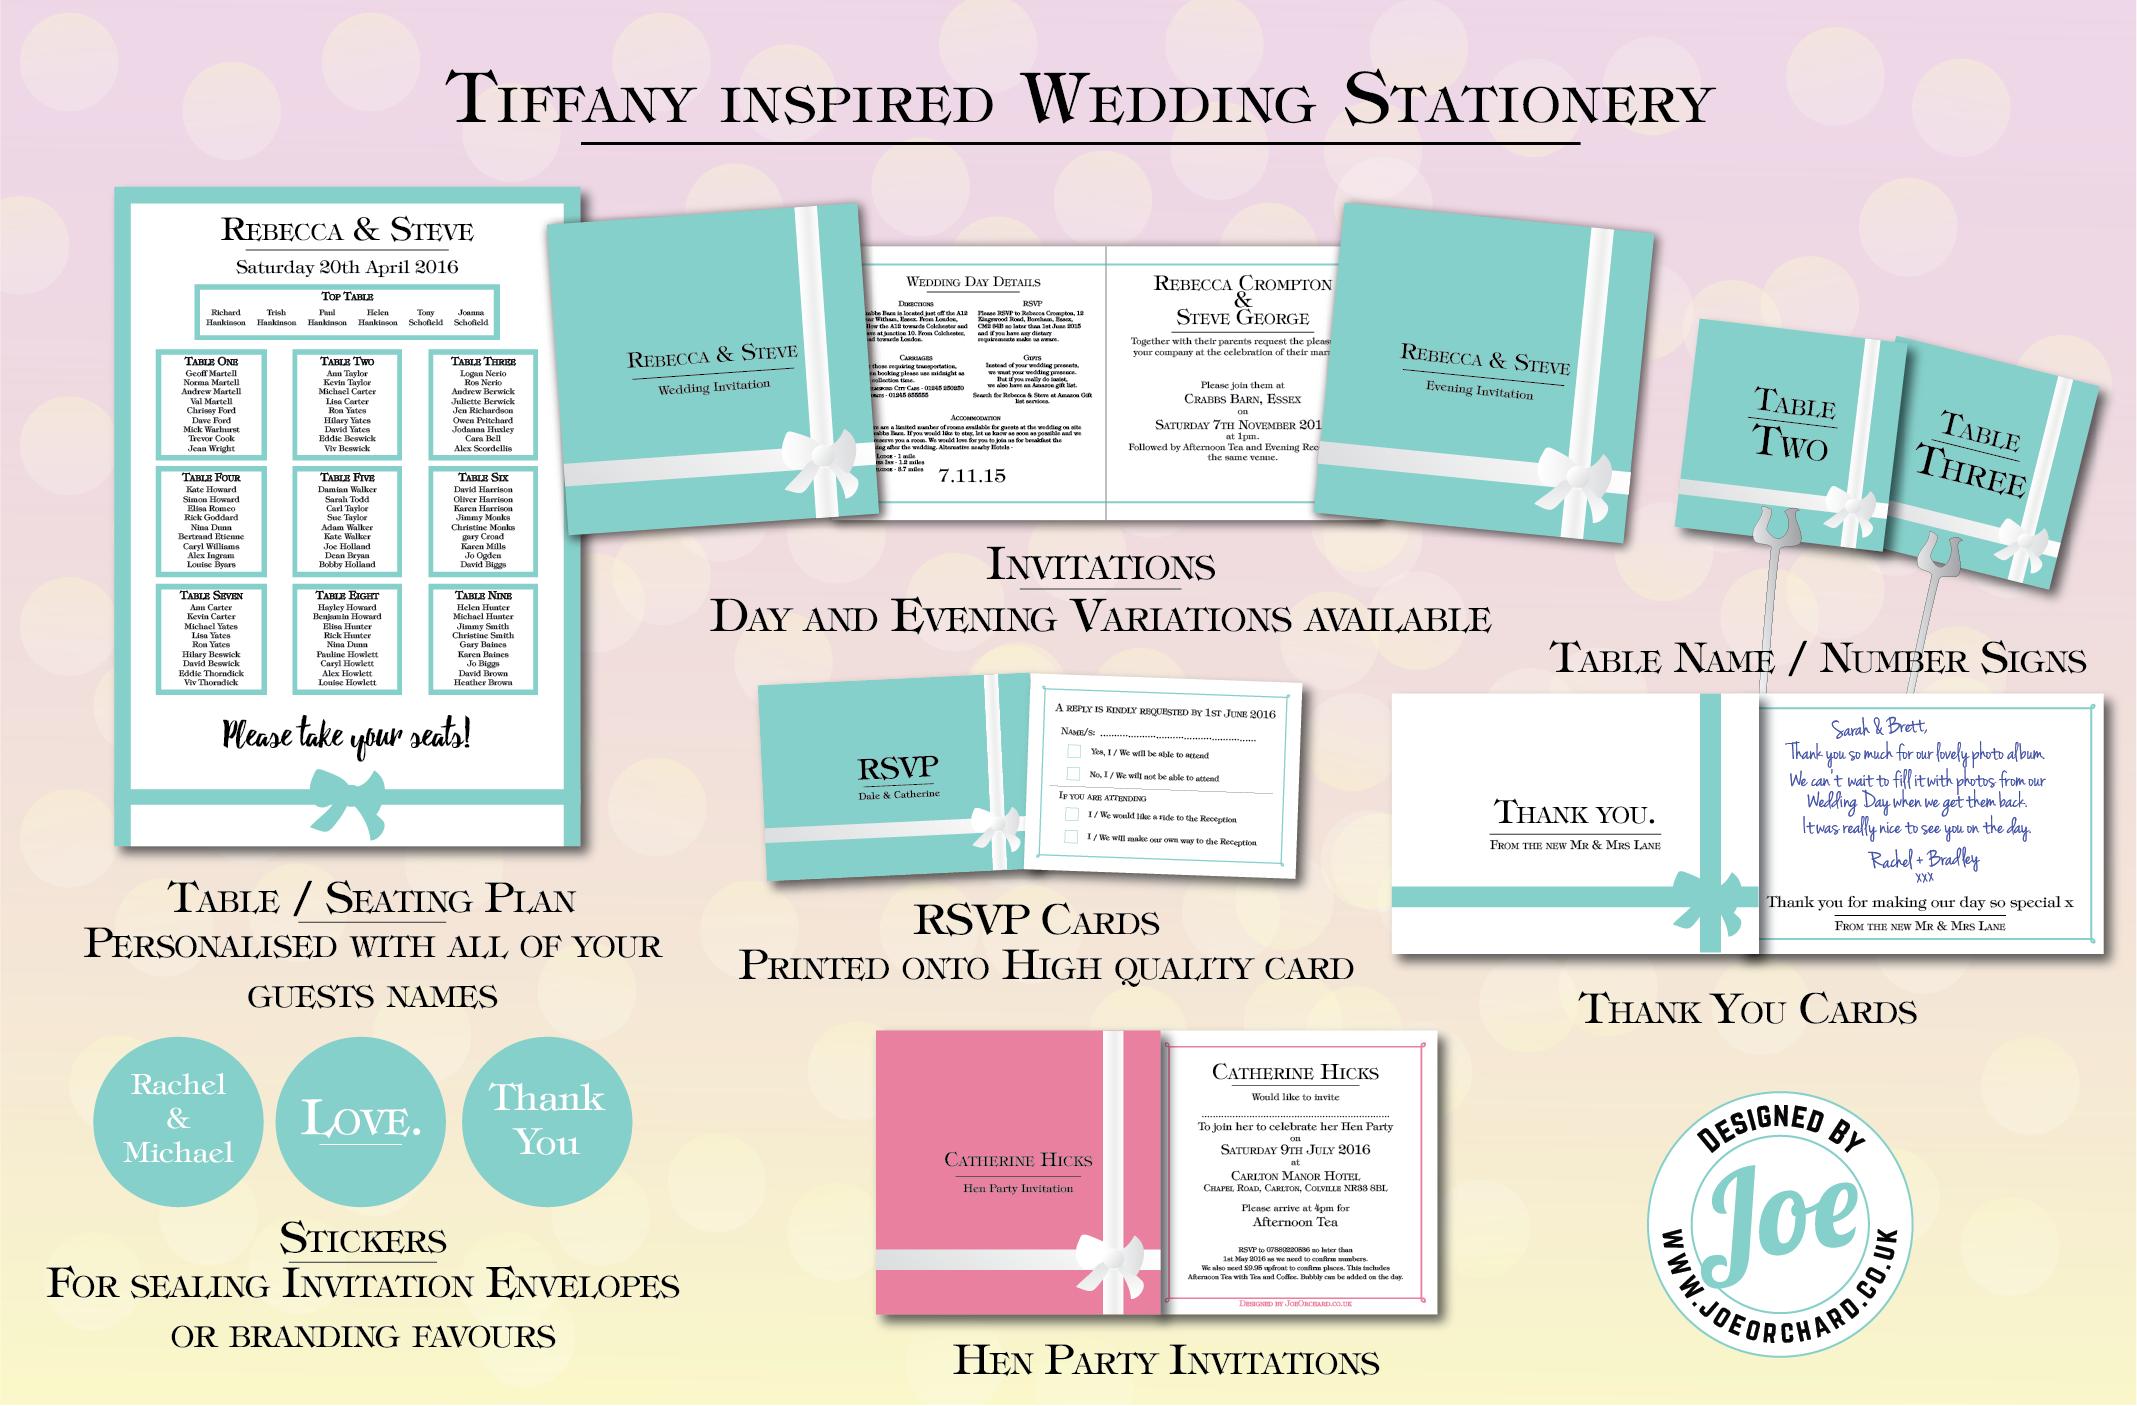 Wedding Stationery by Joe